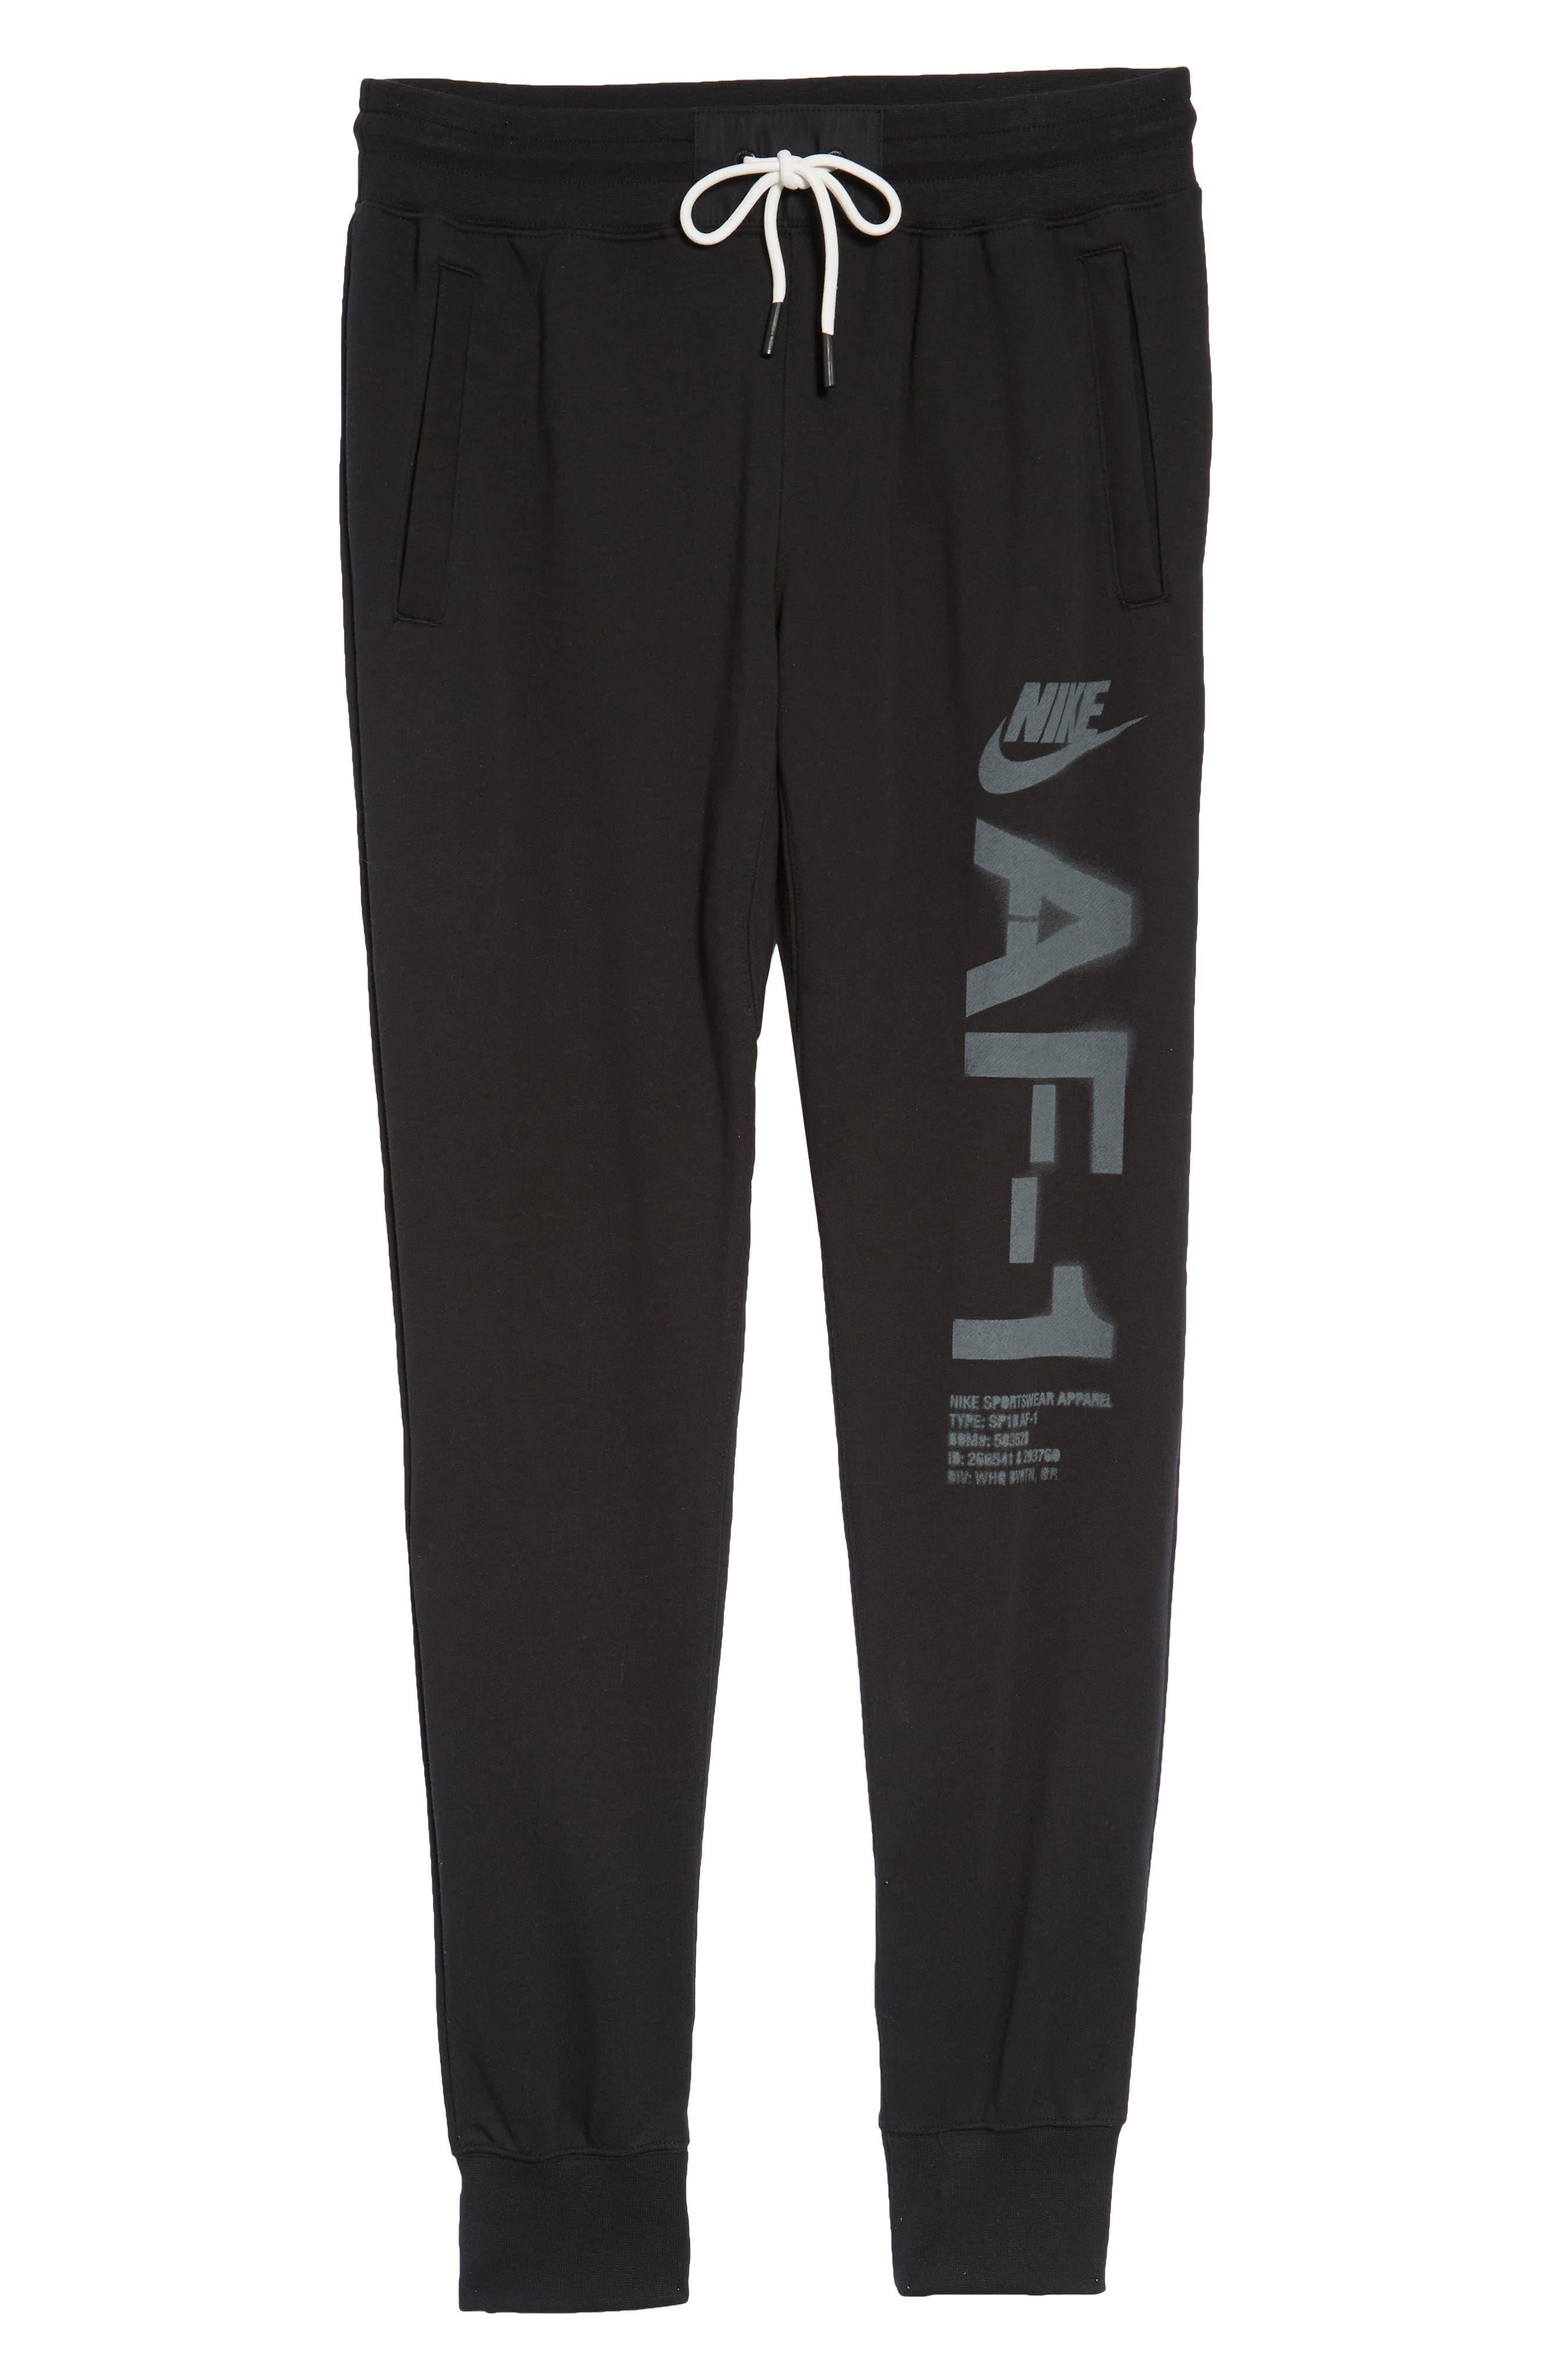 Sportswear Air Force 1 Jogger Pants,                             Alternate thumbnail 6, color,                             BLACK/ ANTHRACITE